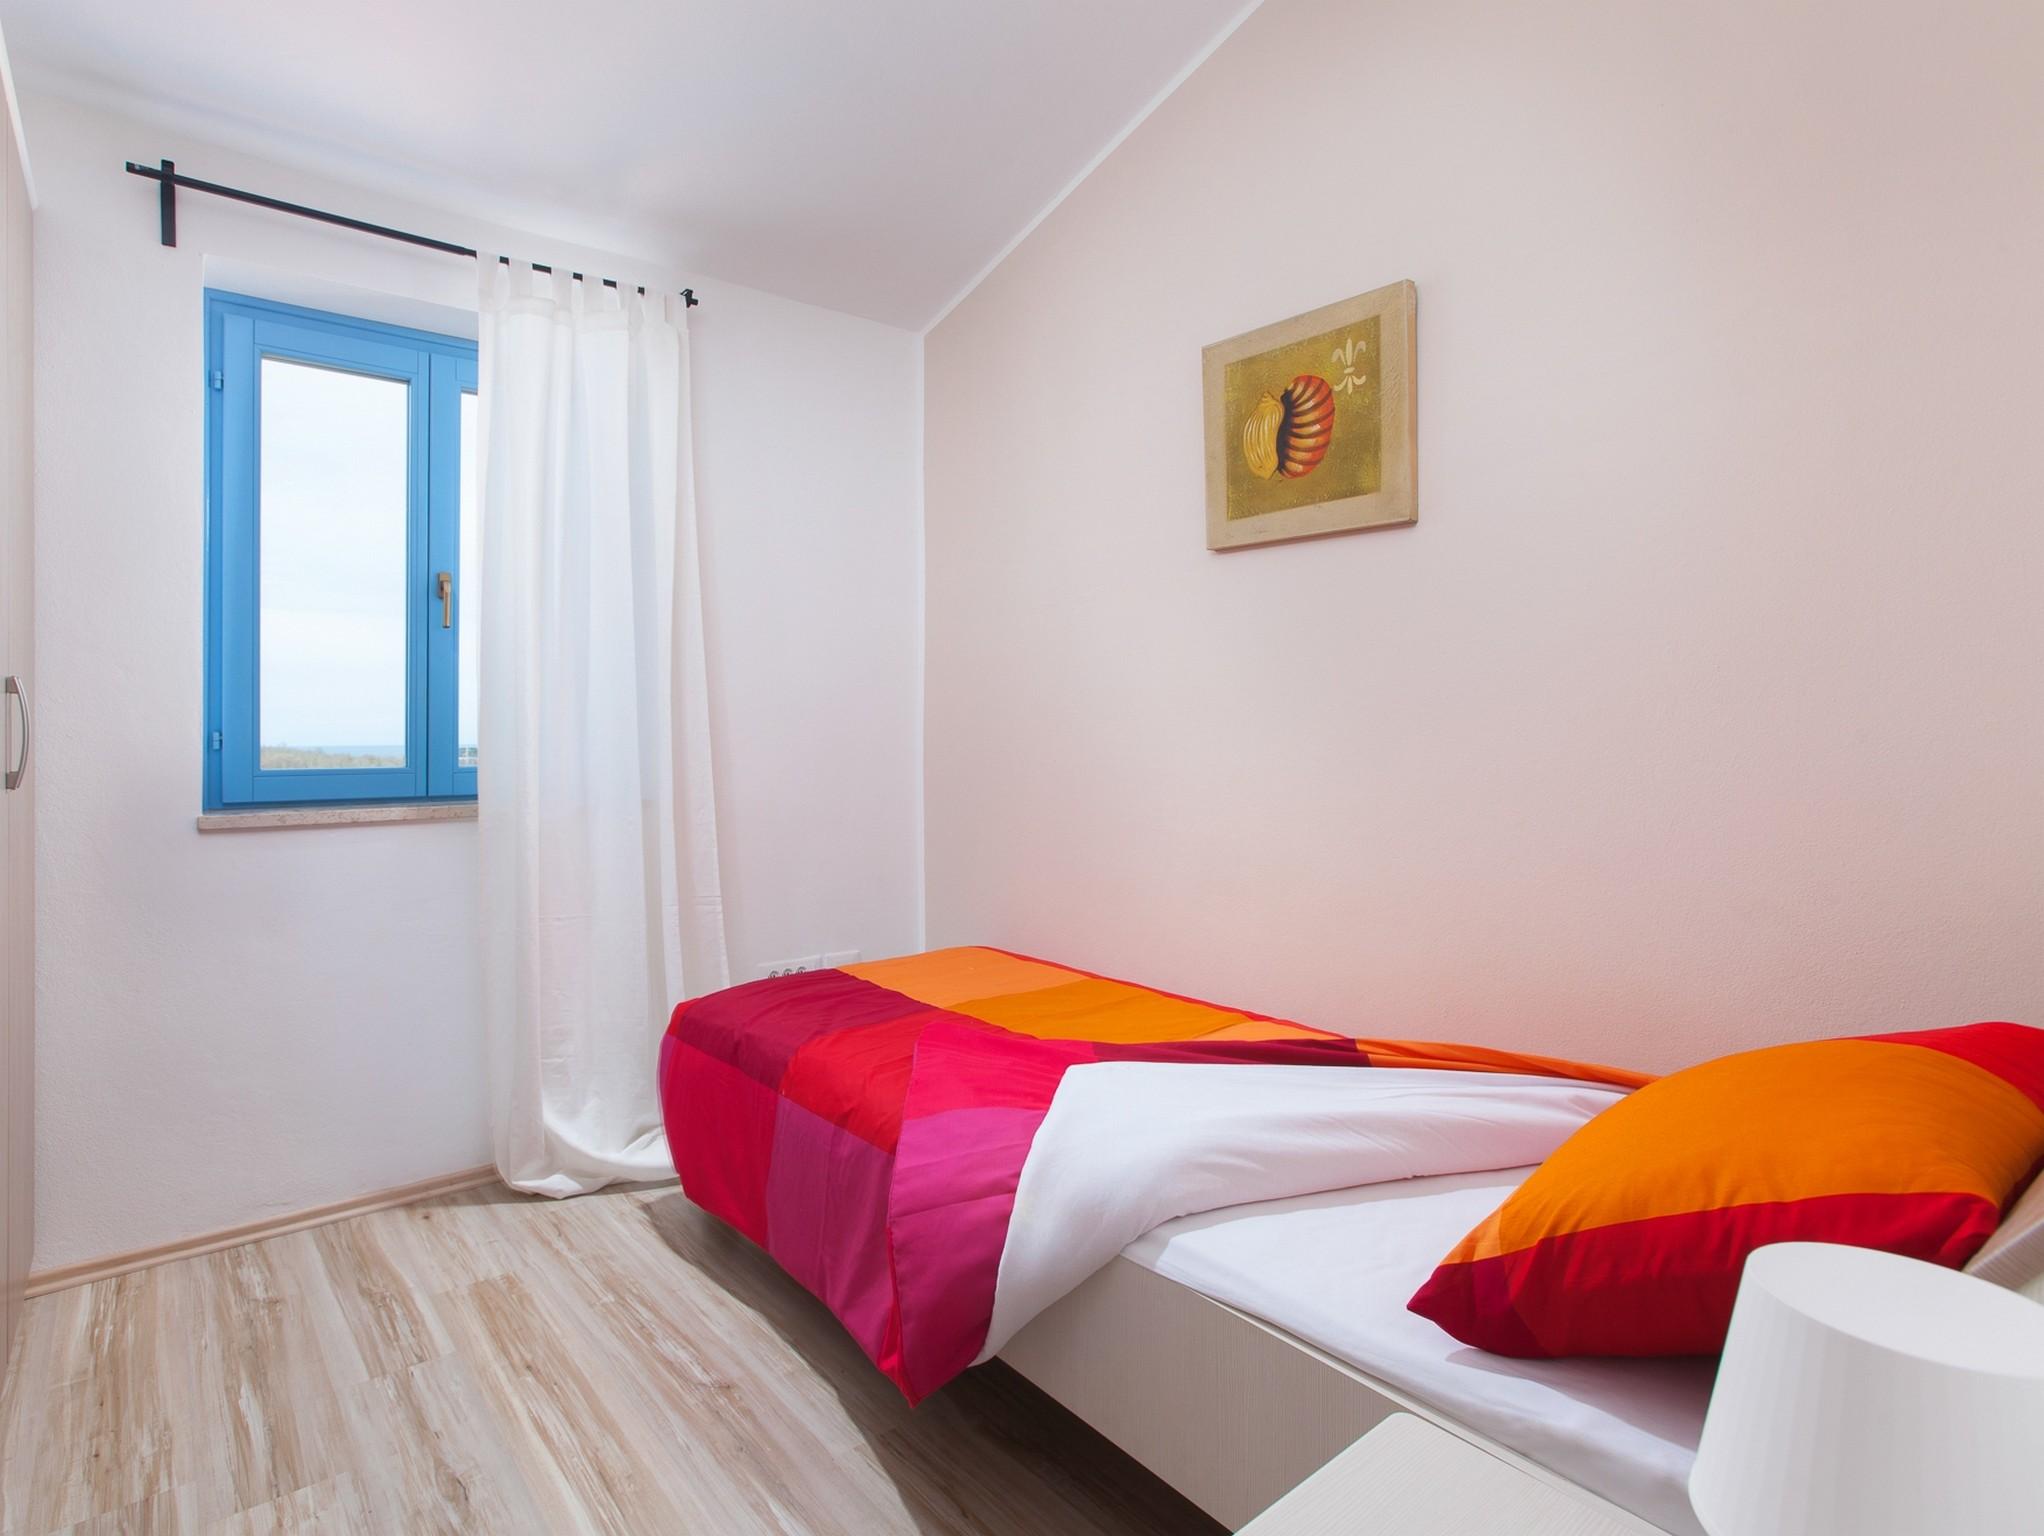 Ferienhaus Bruno, Kua za odmor s bazenom (2204668), Mugeba, , Istrien, Kroatien, Bild 15